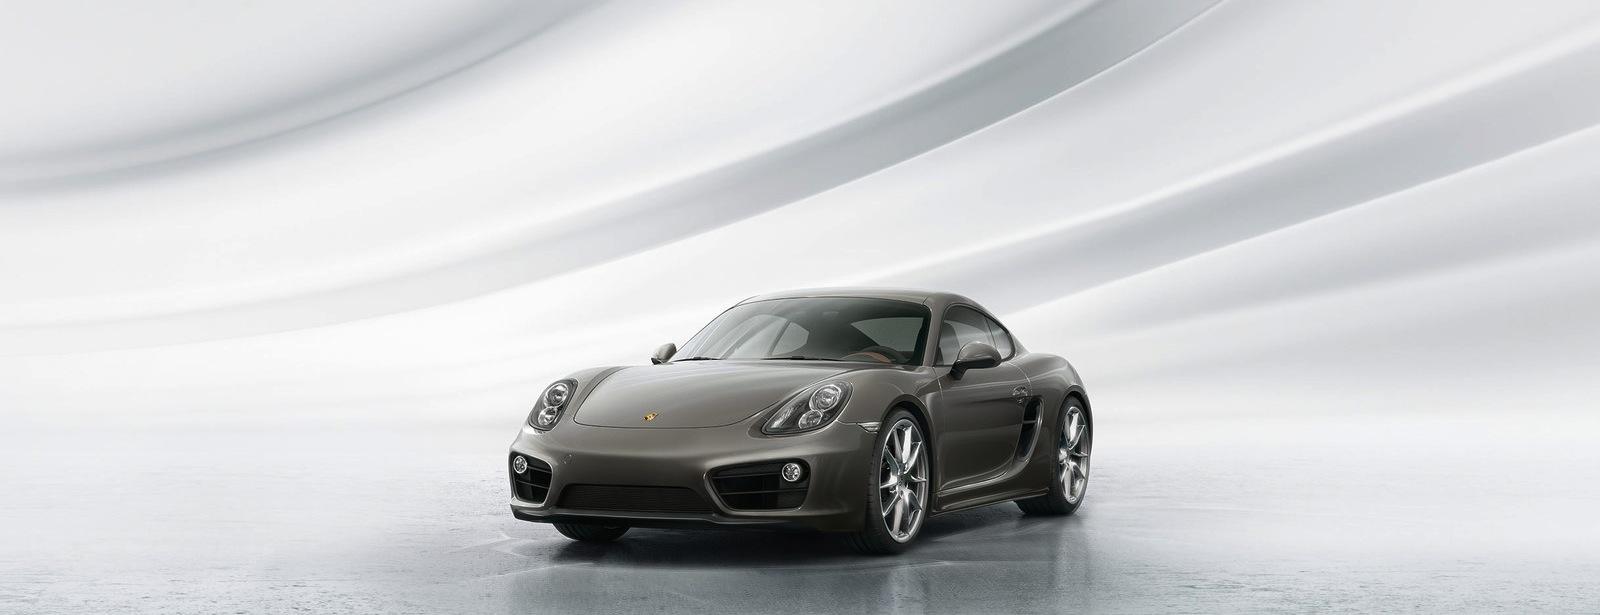 2015 Porsche Cayman Los Angeles